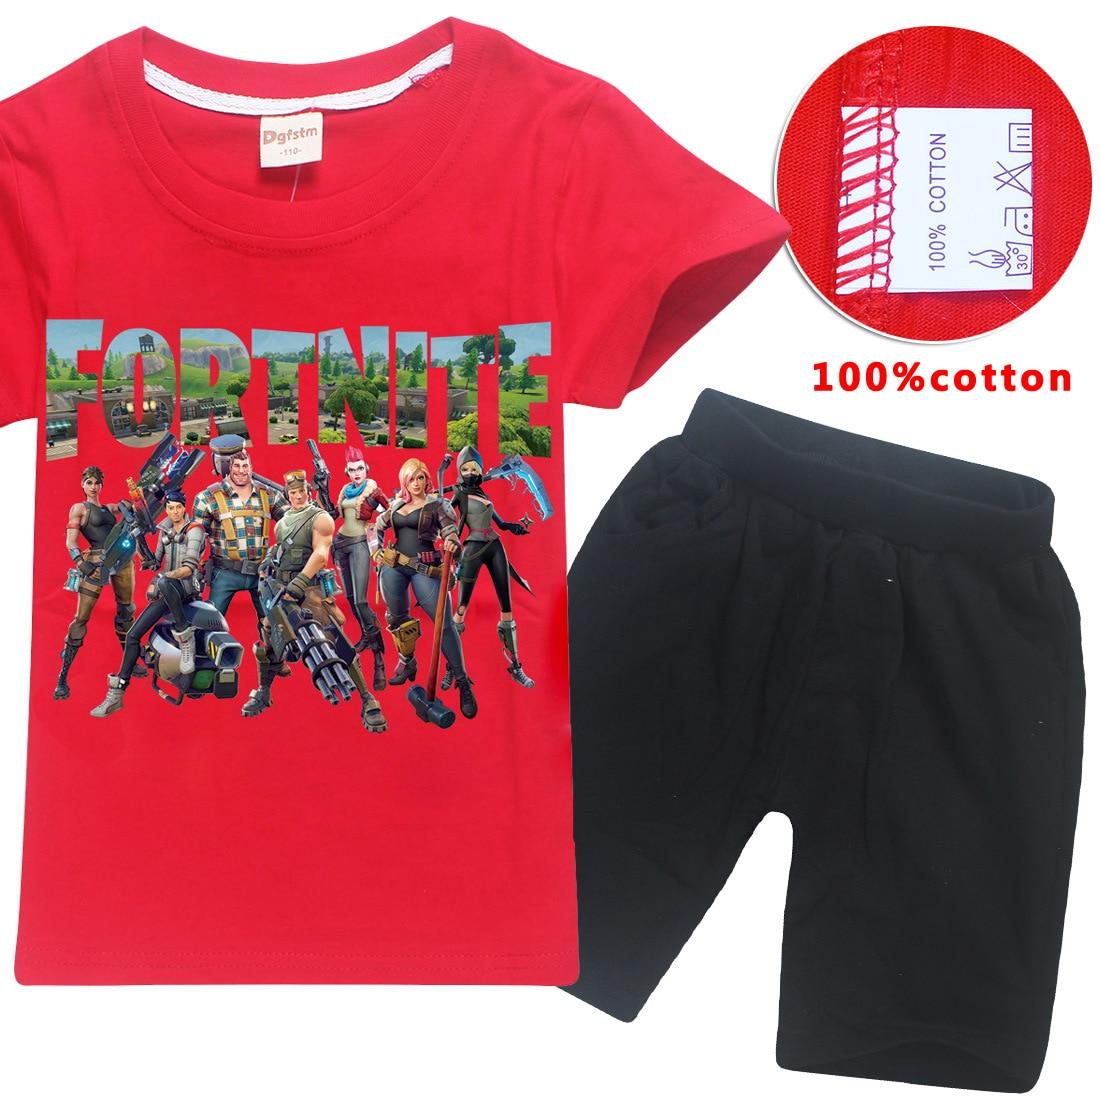 Game Fortnite Print Kids Clothing Set 3D Print Short Sleeve T-Shirt Shorts 2pcs Set Cotton 6-14Y Baby Boys Girls Sports Clothes